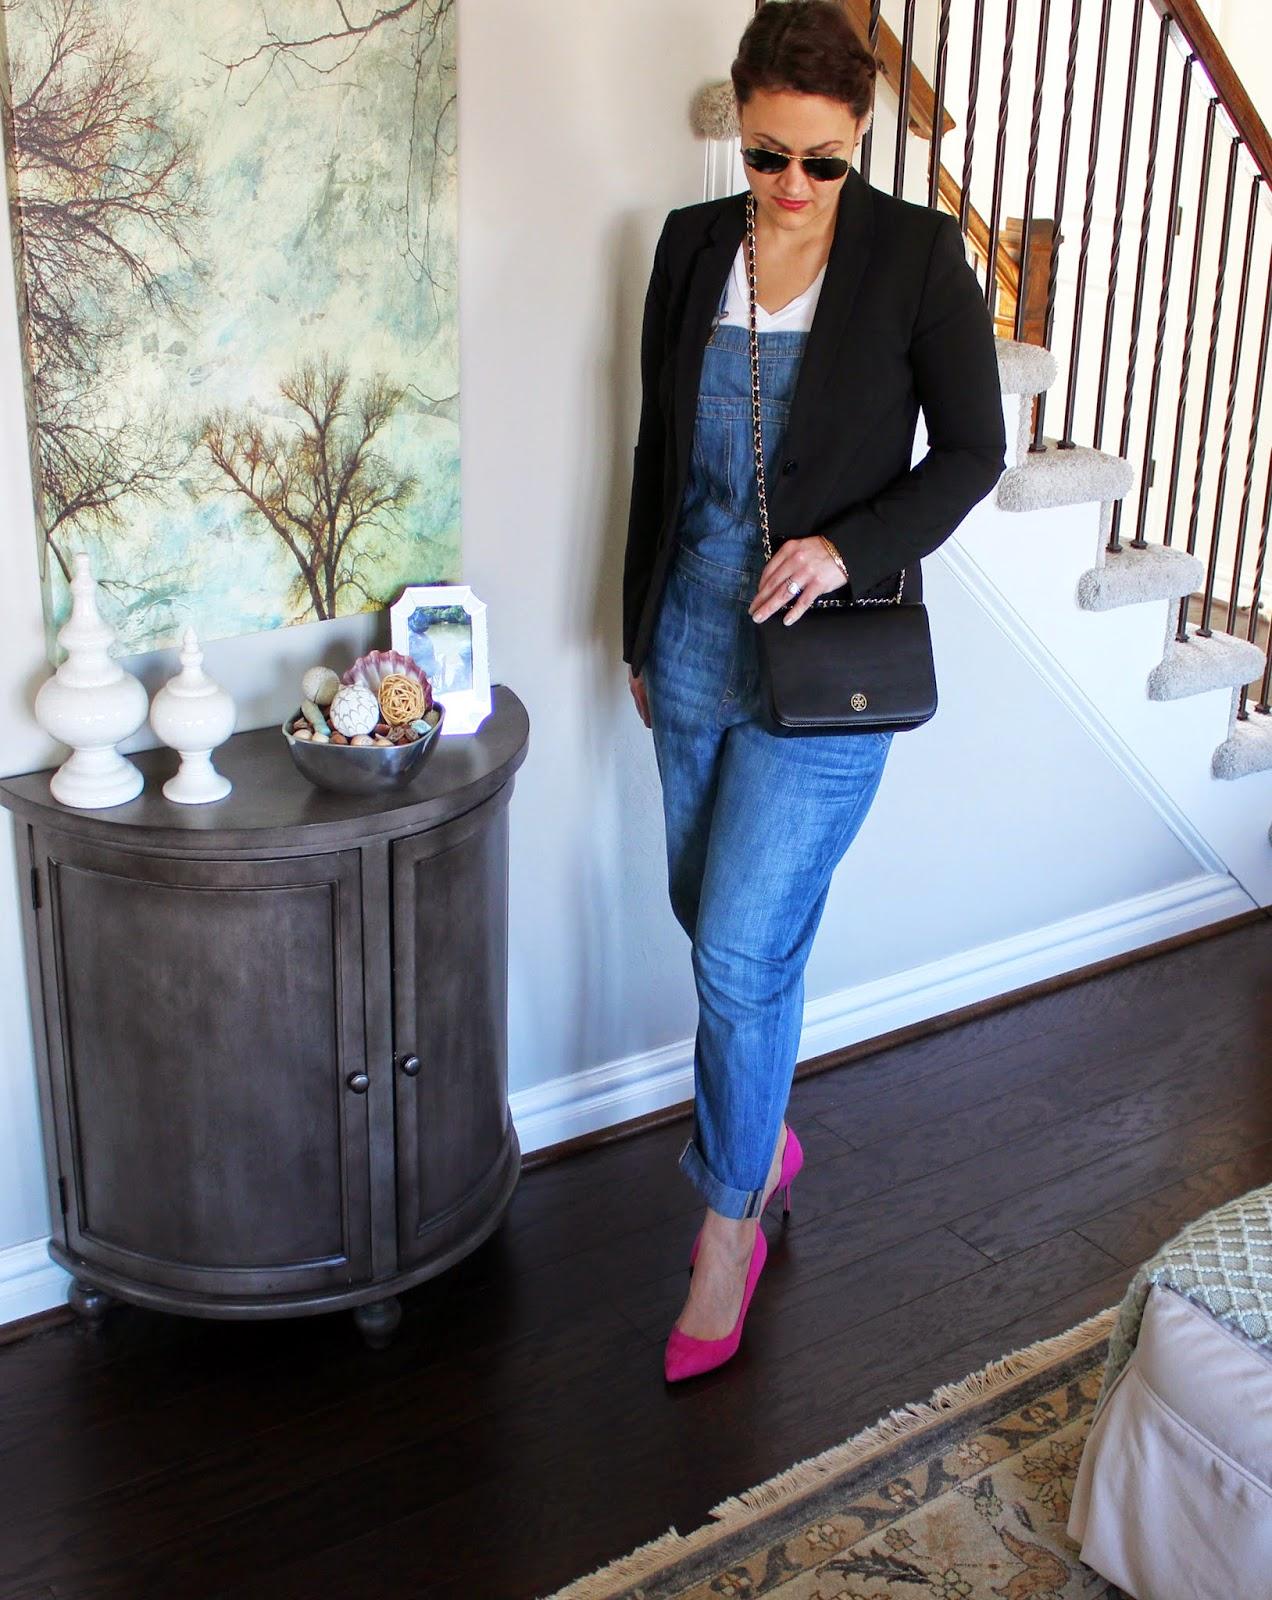 Gap black blazer, Madden Girl Pink Dorsay pump, rayban, overalls, tory burch cross body, robinson,